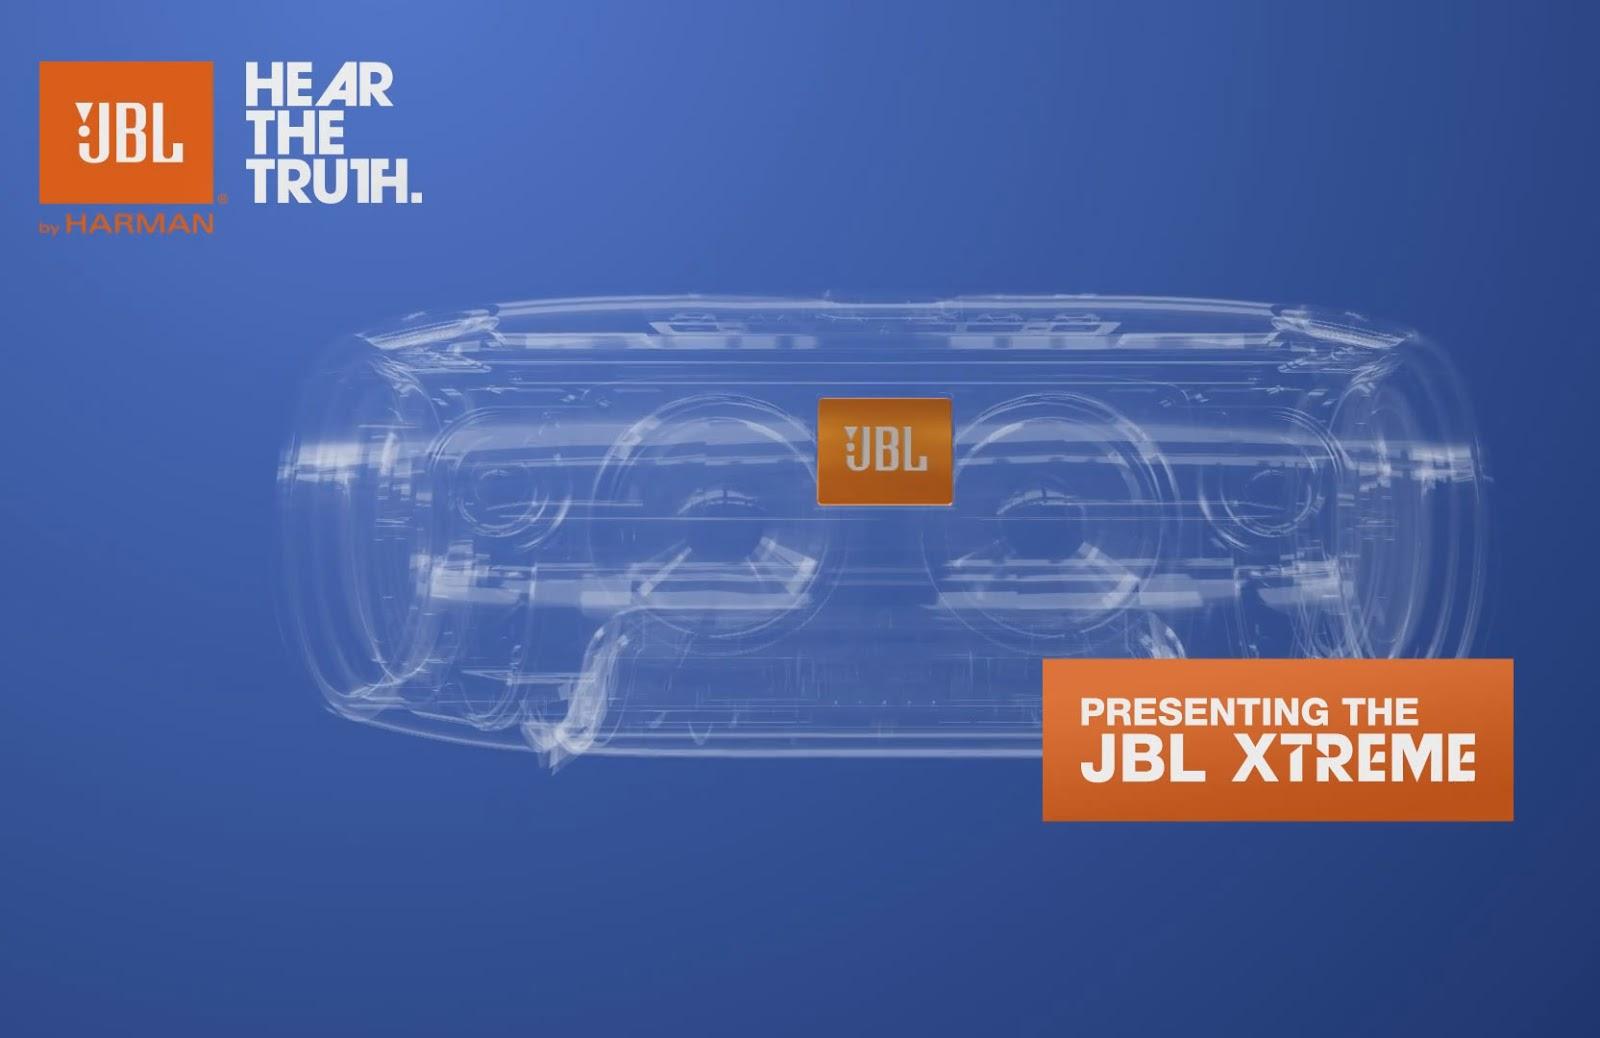 Oluv's Gadgets: News: JBL Xtreme coming soon - blown up JBL